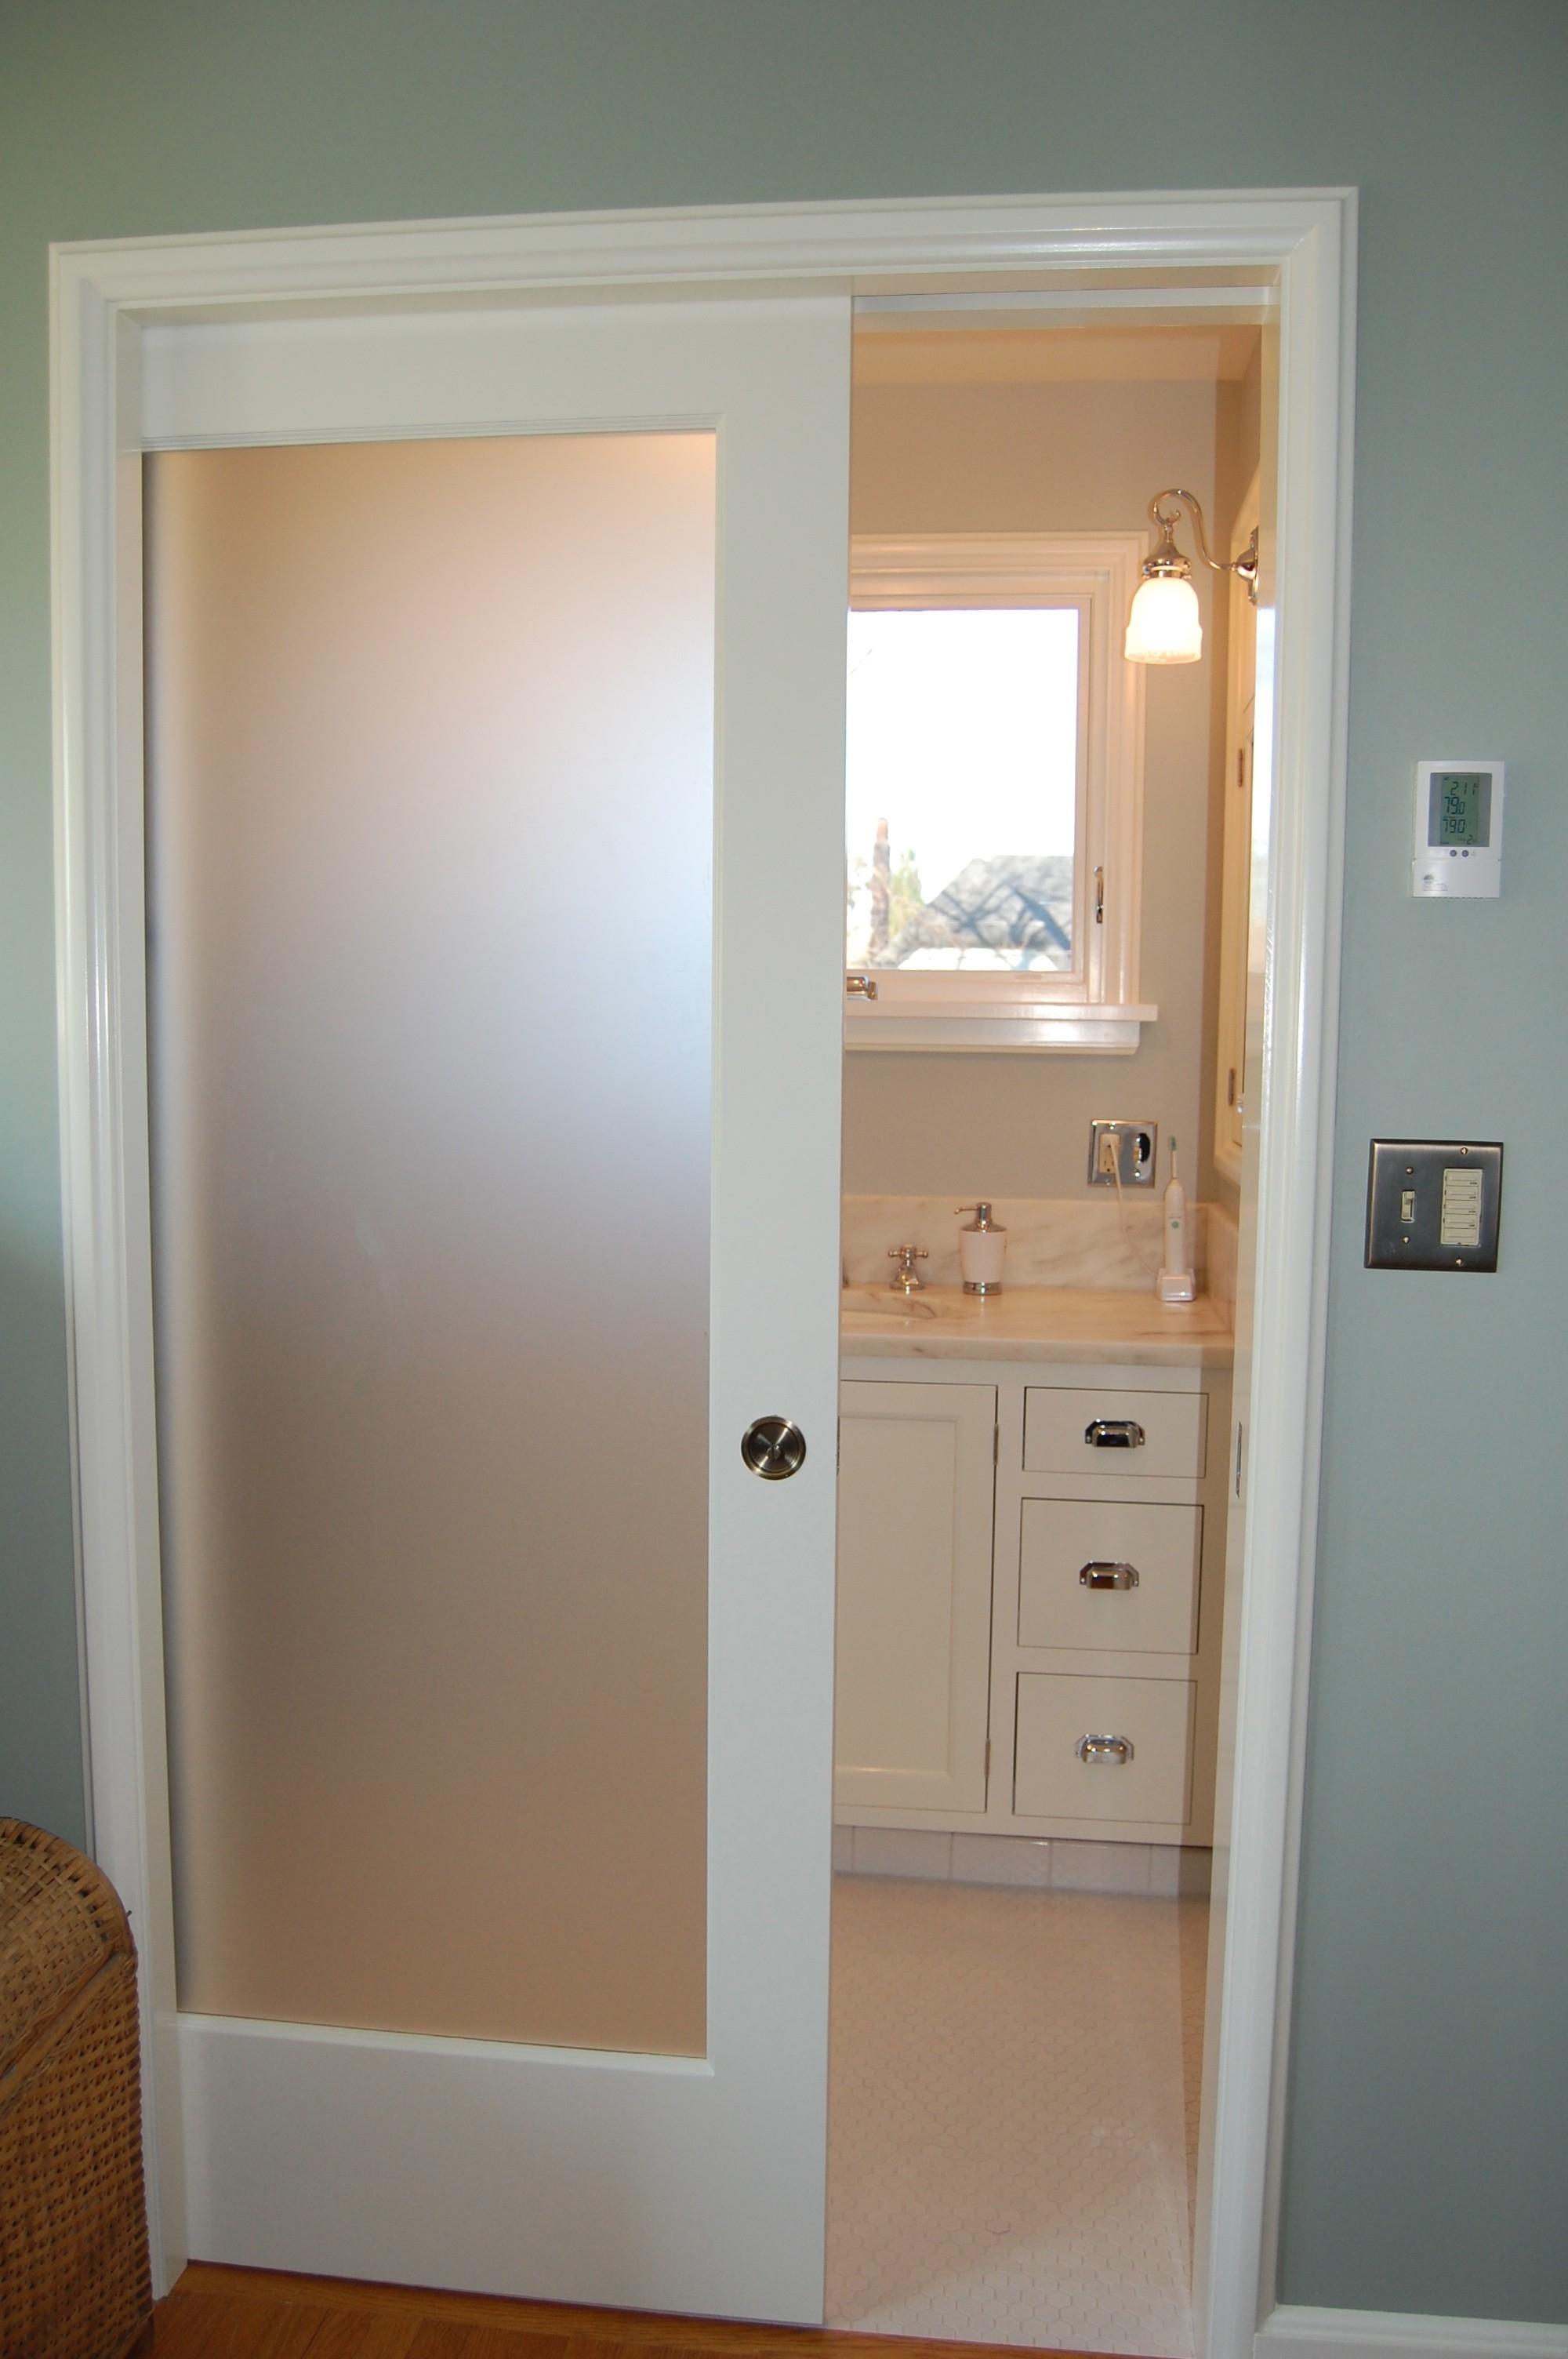 Sliding Bathroom Door Into Wall Sliding Doors